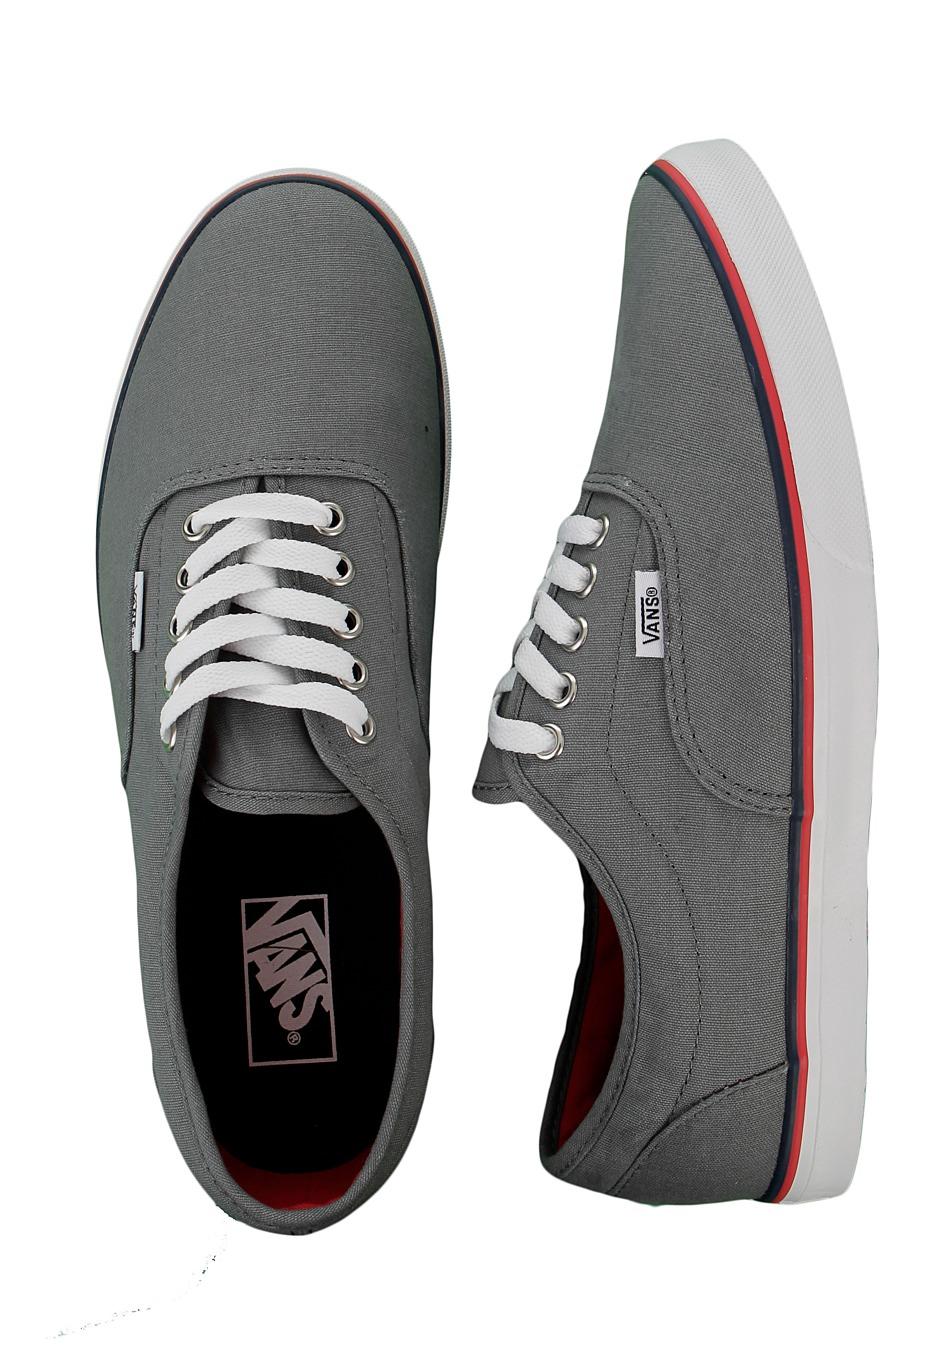 09e7ef56c58 Vans - LPE Tri Binding Monument - Shoes - Impericon.com UK